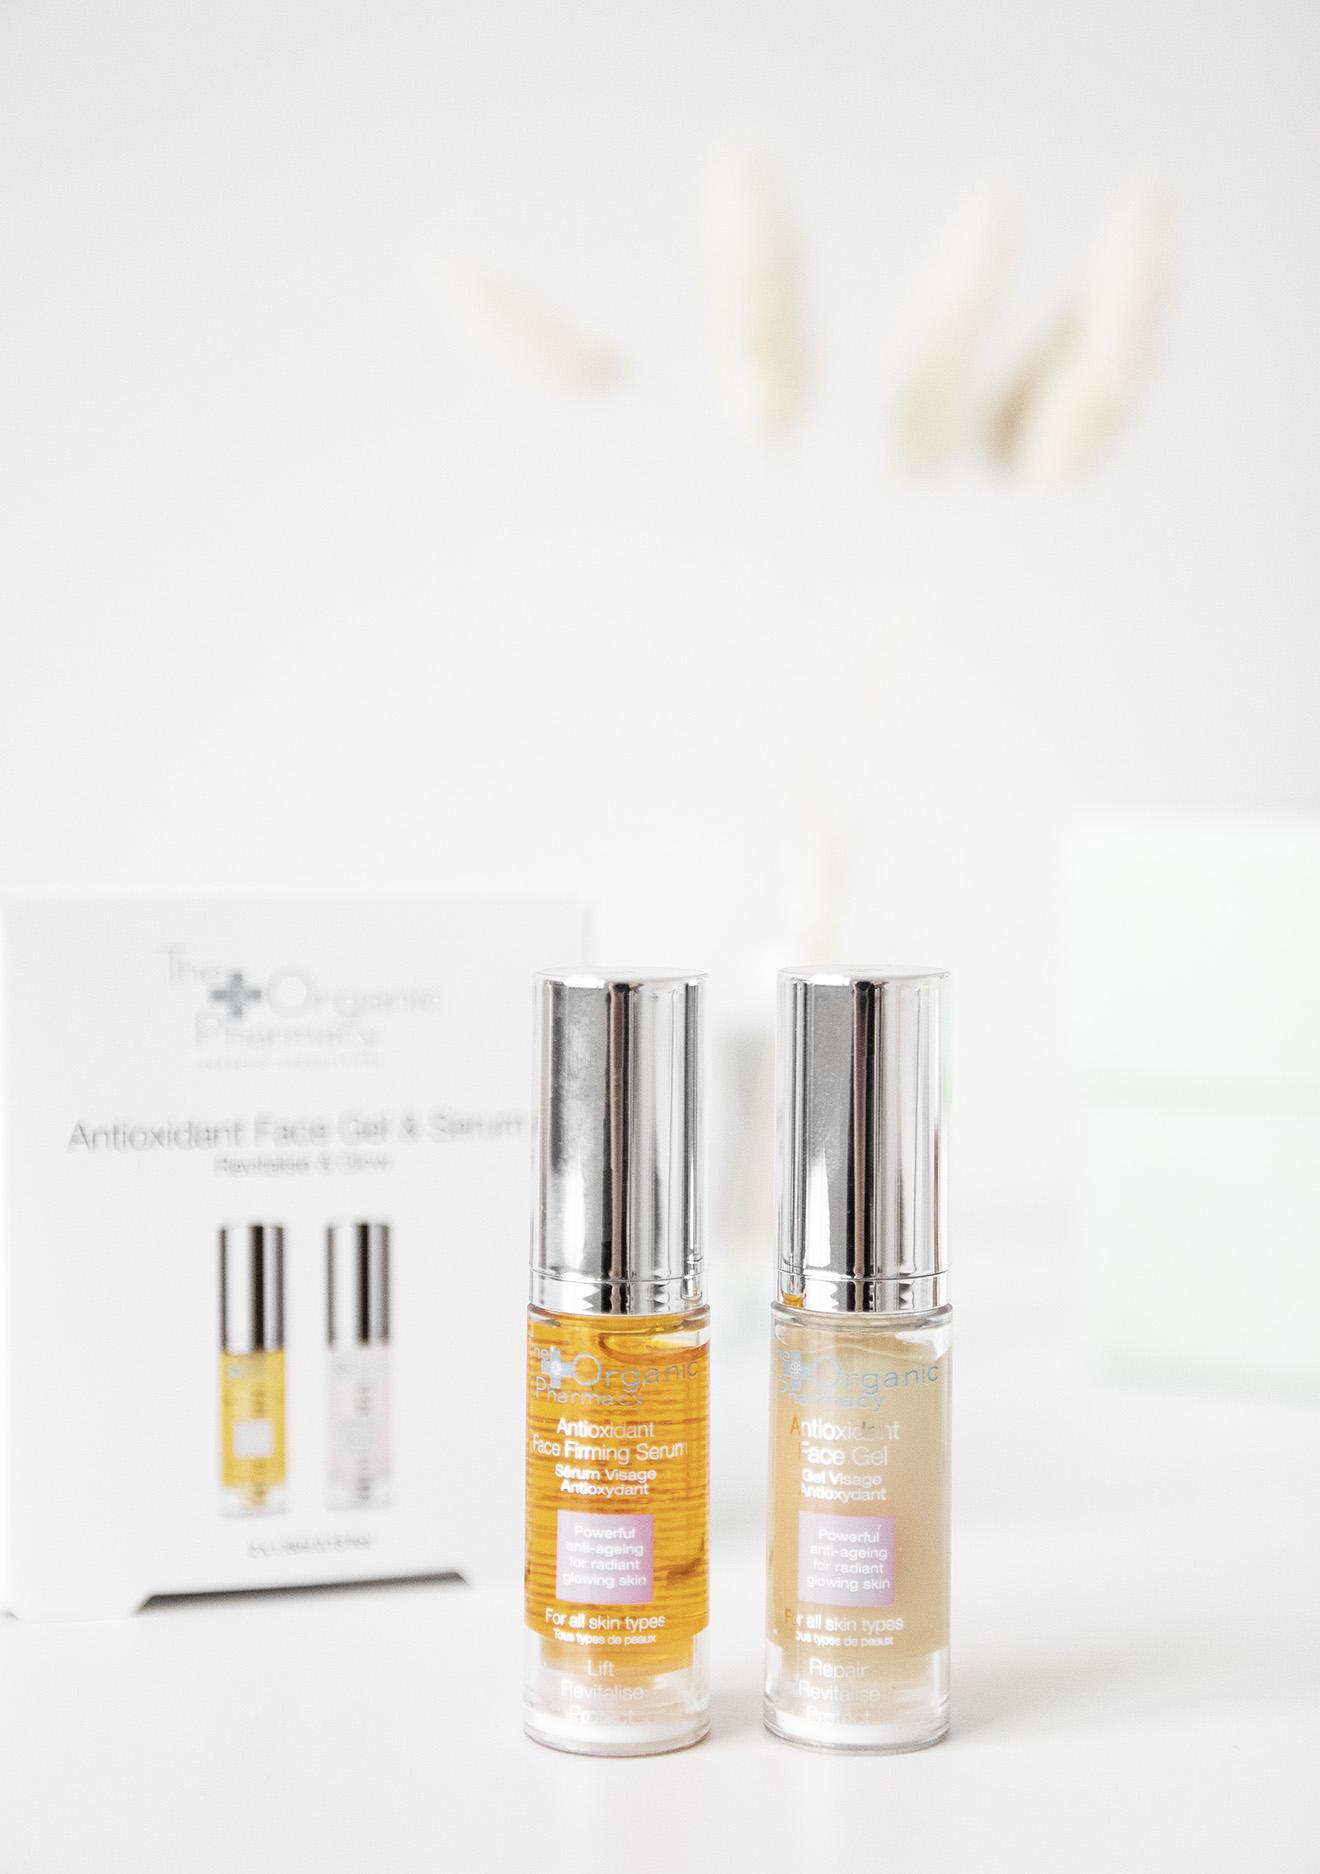 The Organic Pharmacy Antioxidant Face Gel and Serum Kit